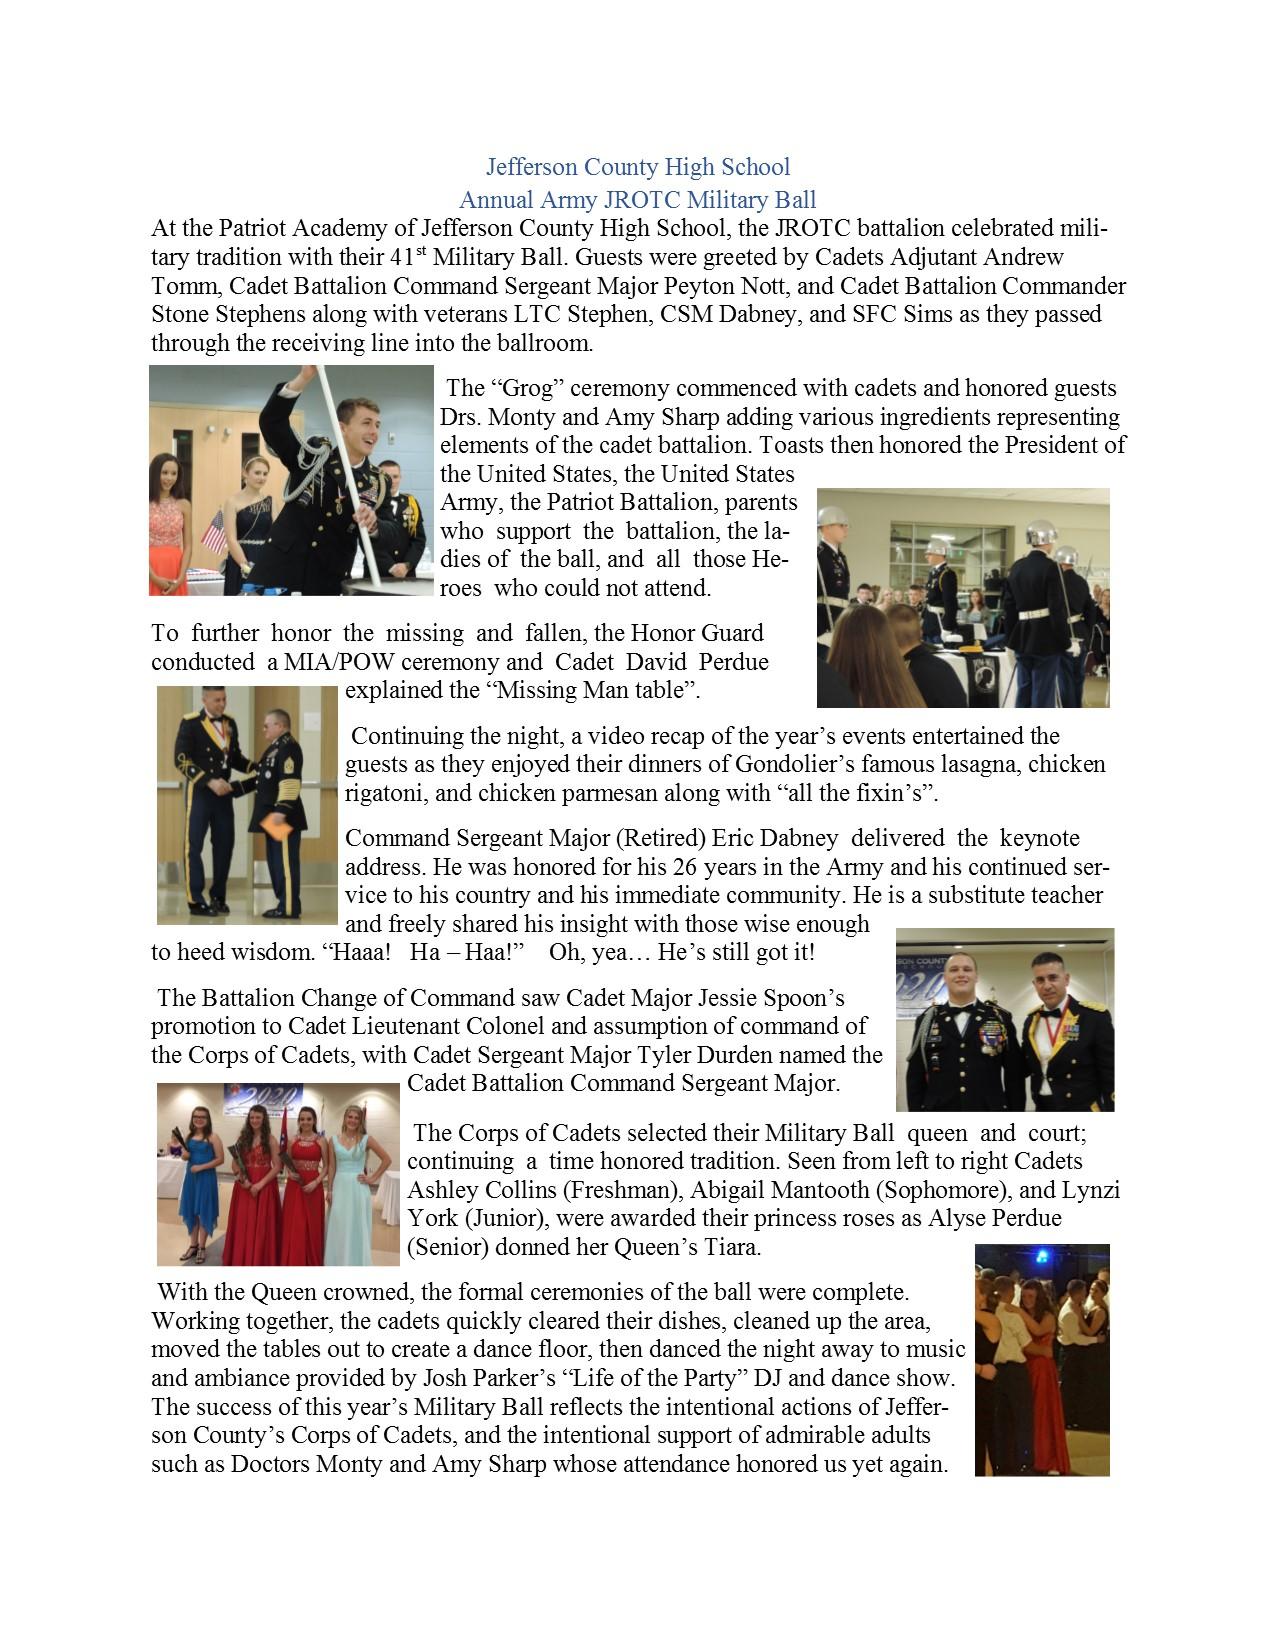 jefferson county high school jchs annual army jrotc military ball rh jchs jc schools net Curriculum Pacing Guide For Math Pacing Guide